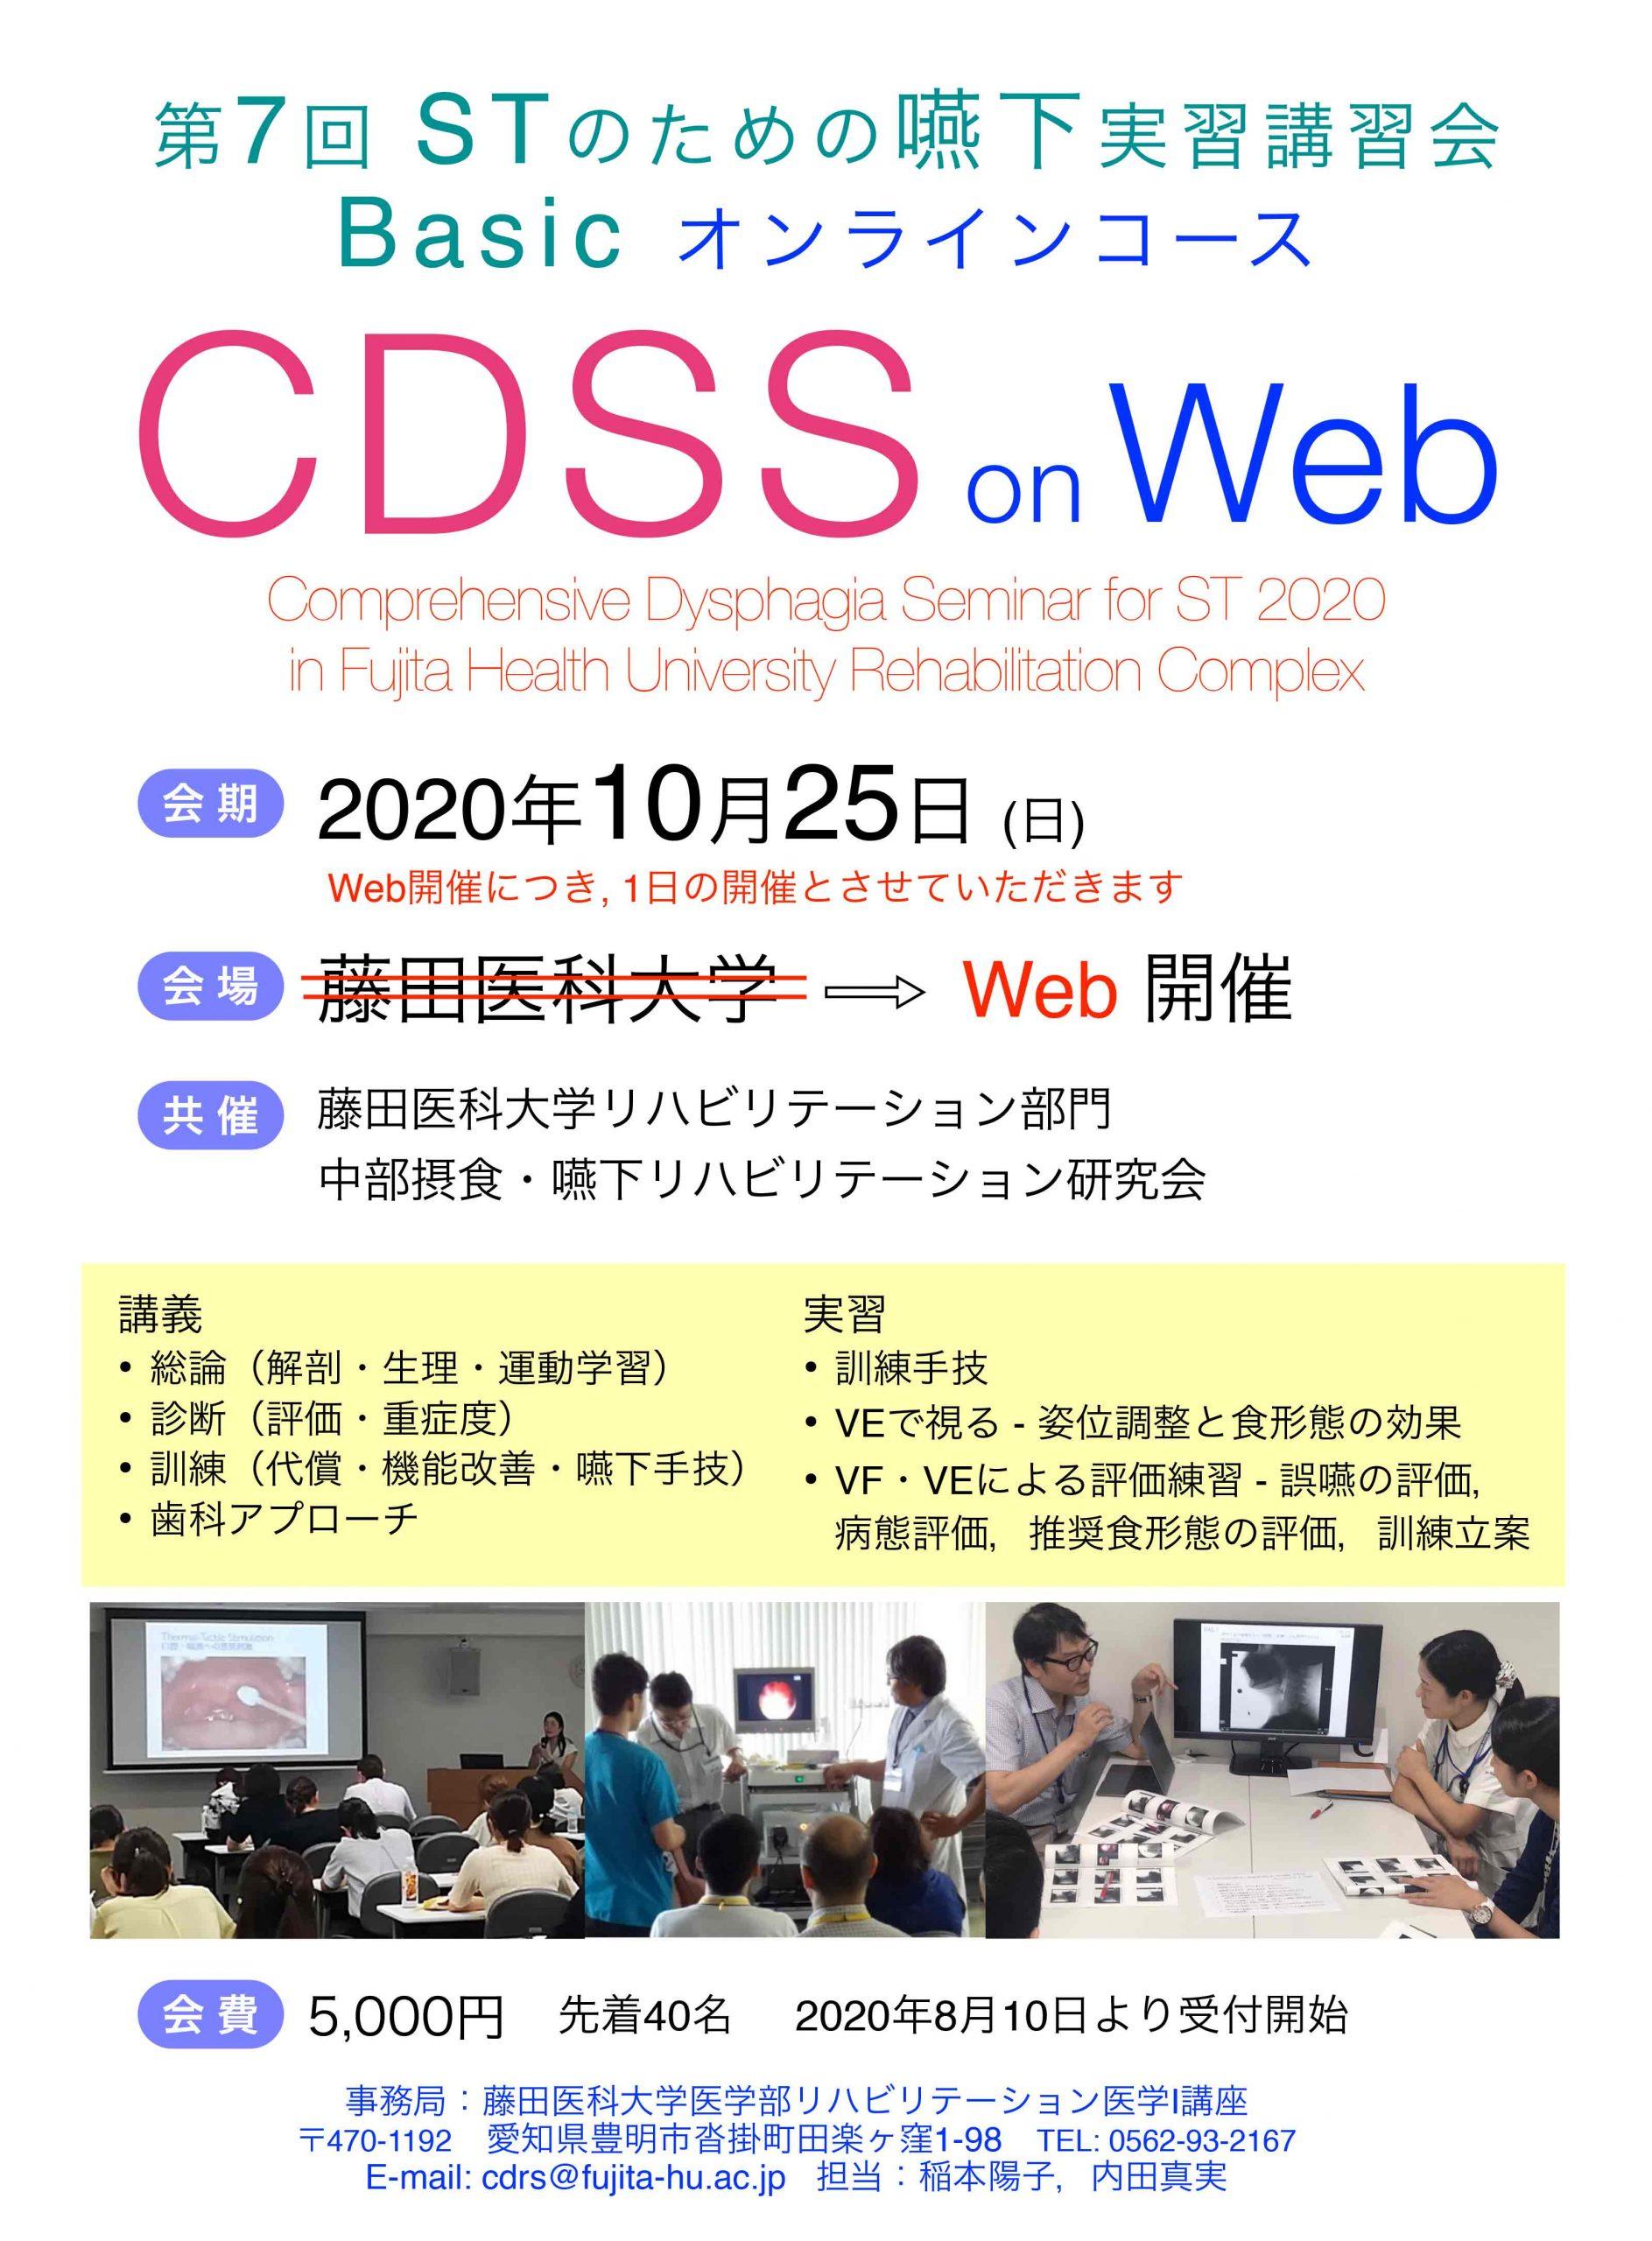 CDSSon Web